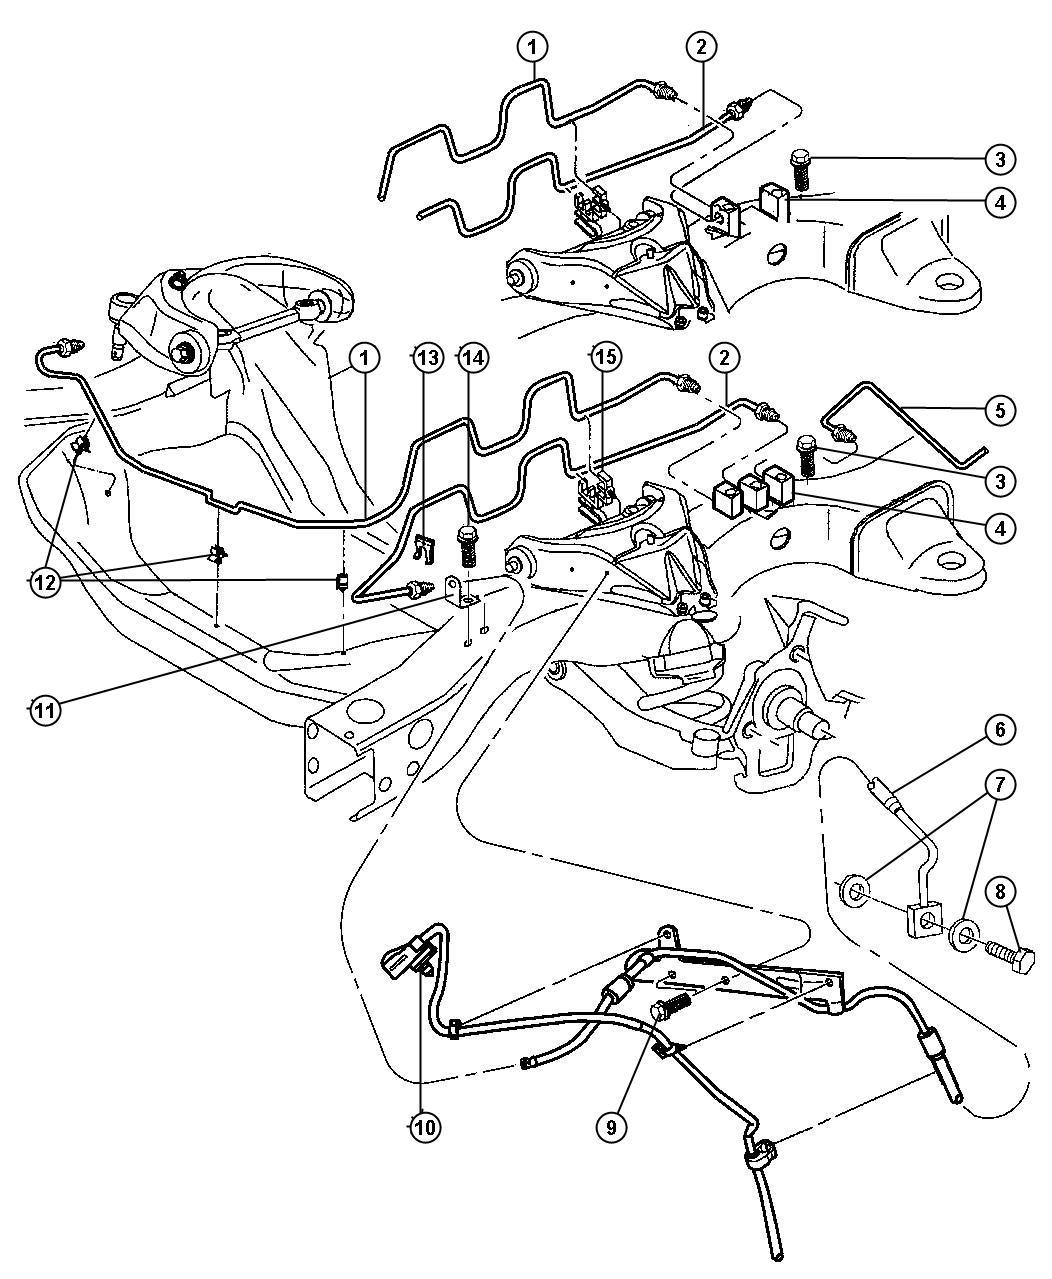 hight resolution of ship wiring diagram symbols moreover dodge dakota brake system 2000 dodge dakota vacuum line diagram new